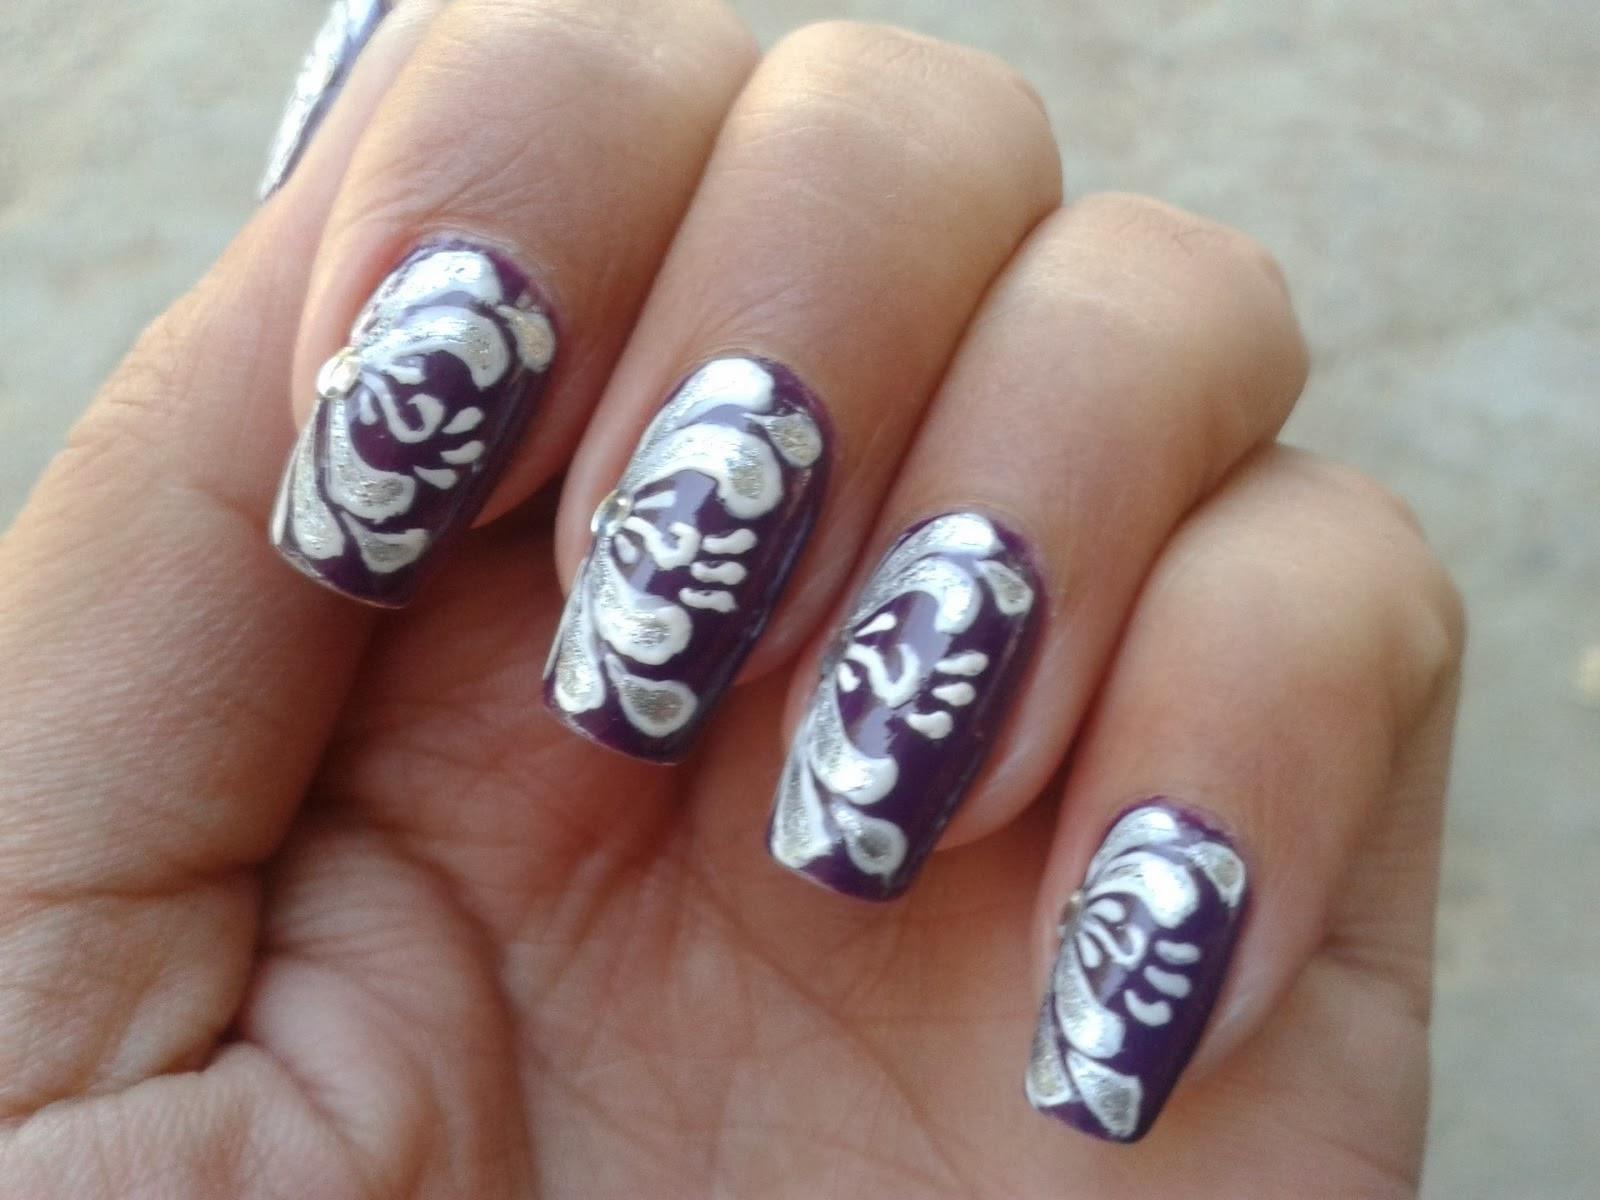 creative easy nail art designs gallery - nail art designs